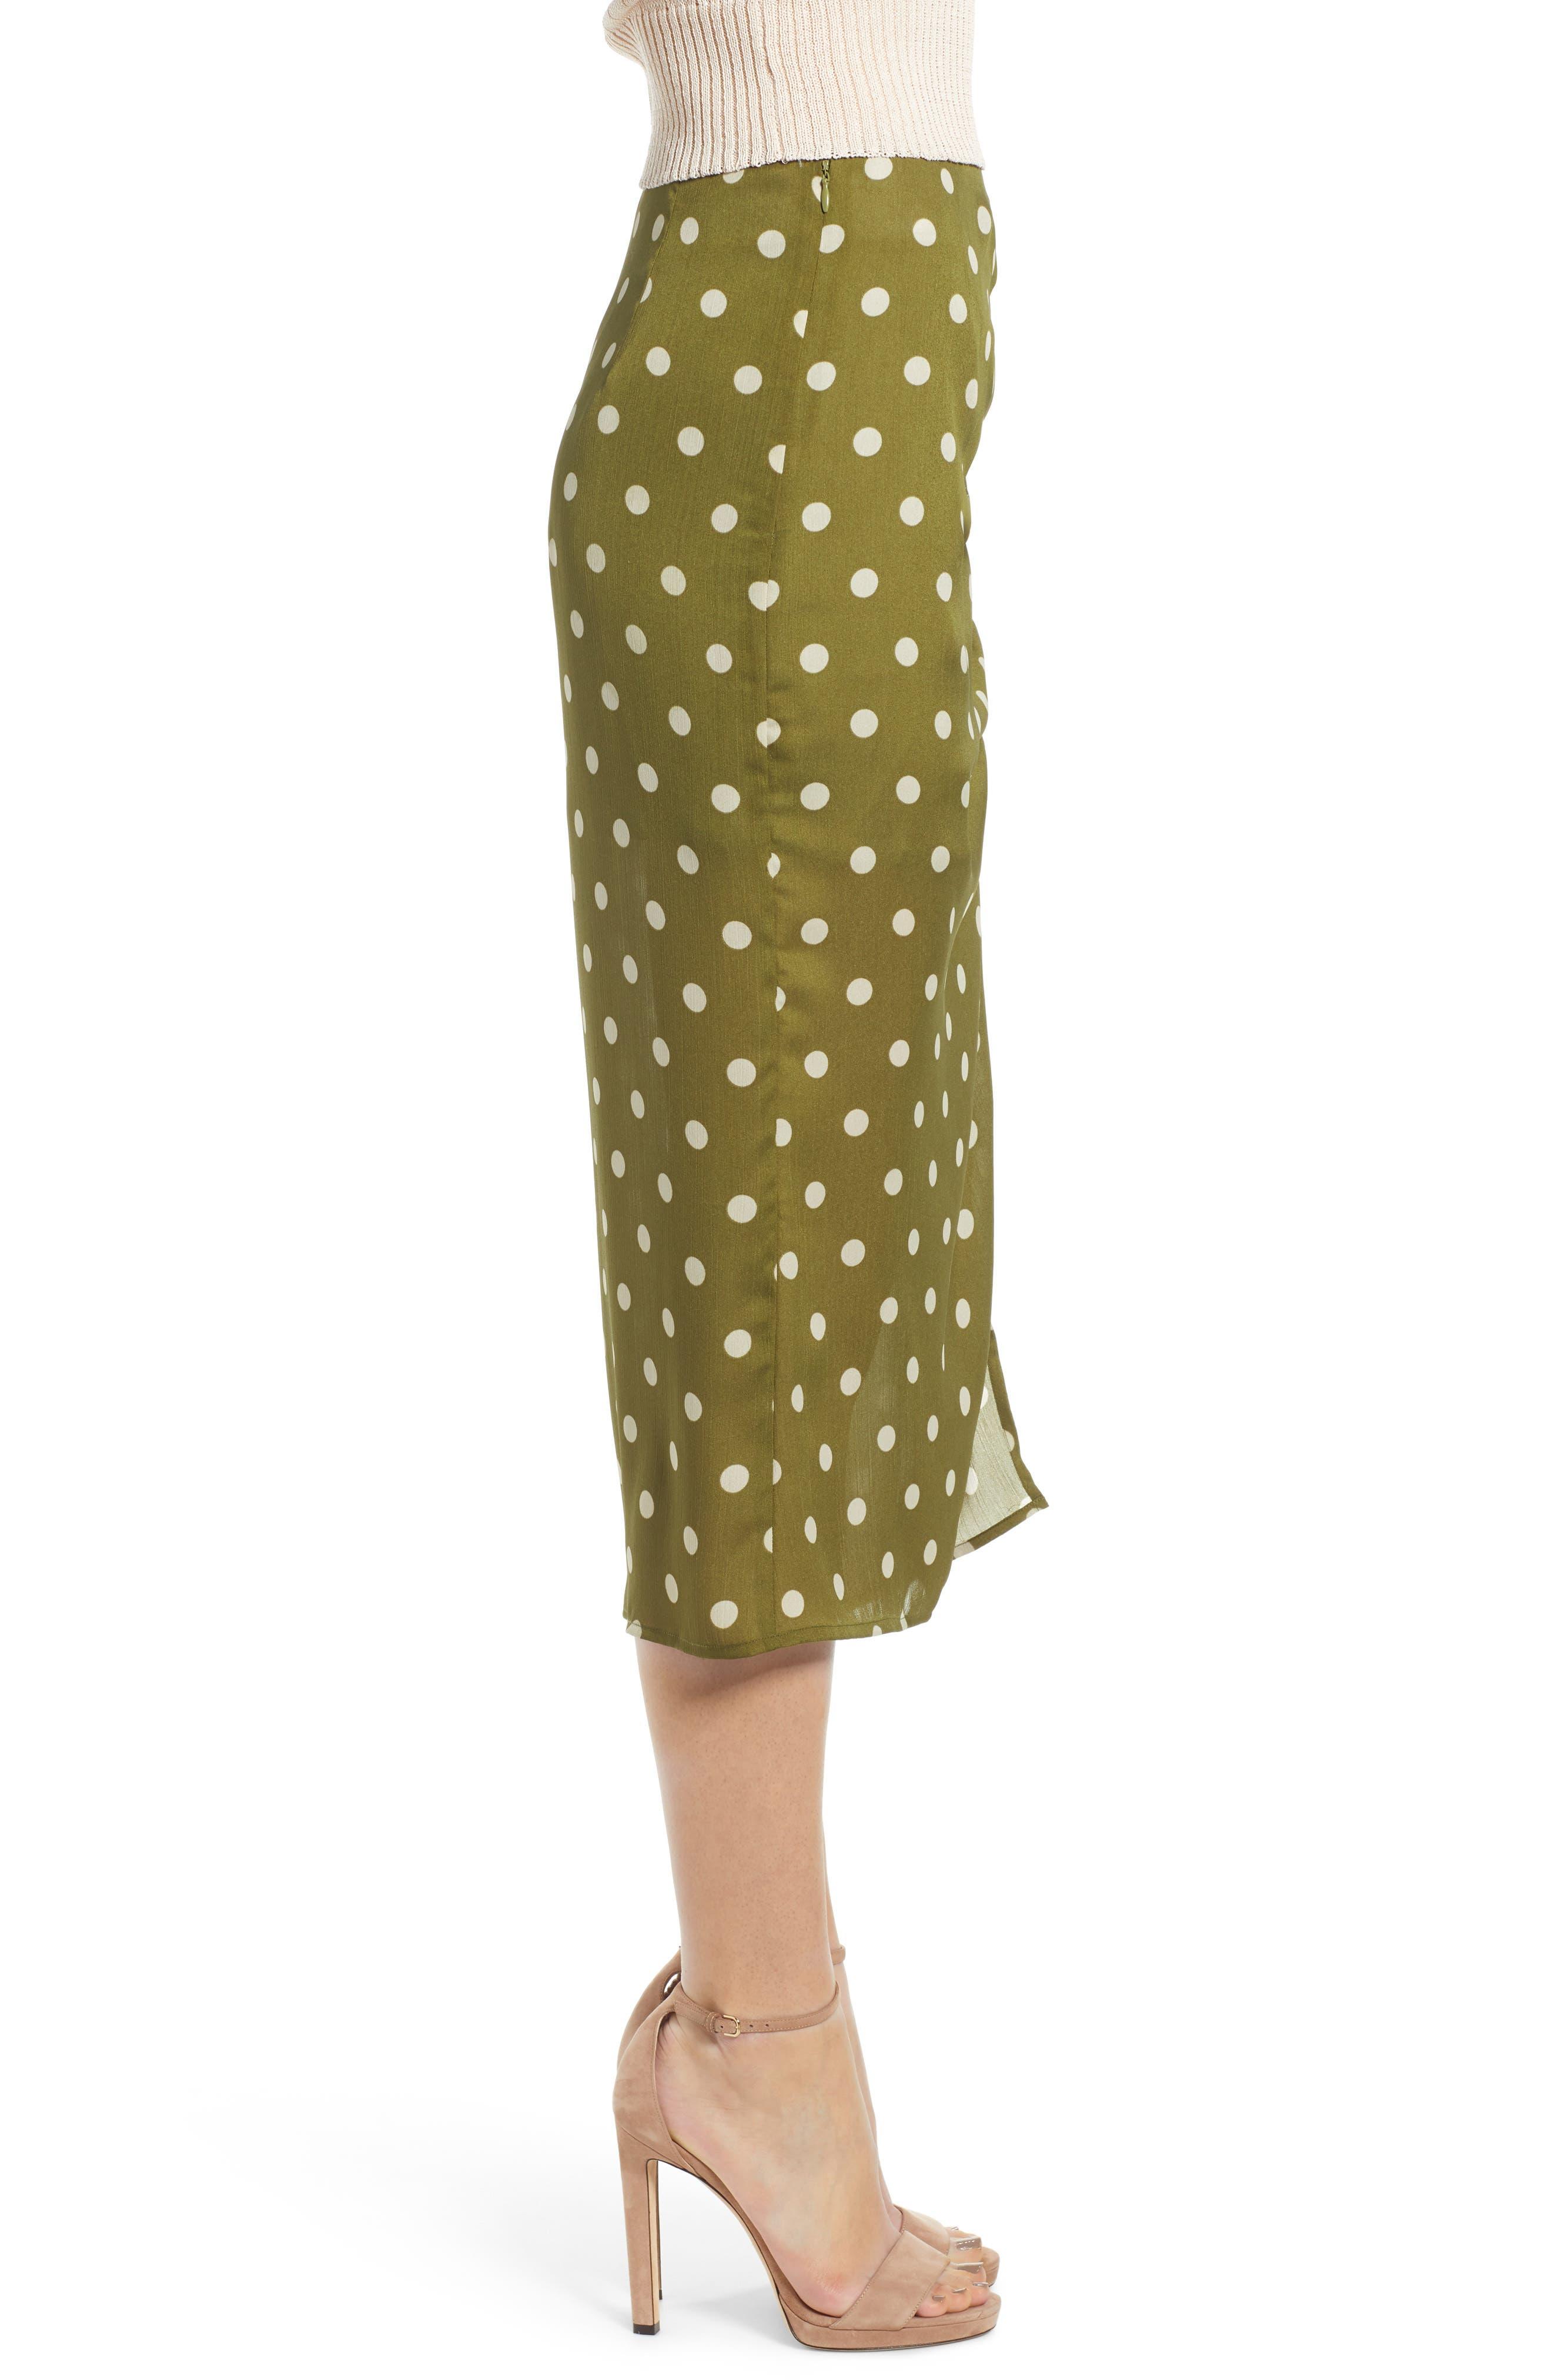 CHRISELLE LIM COLLECTION, Chriselle Lim Ren Ruched Skirt, Alternate thumbnail 3, color, CREAM/ OLIVE